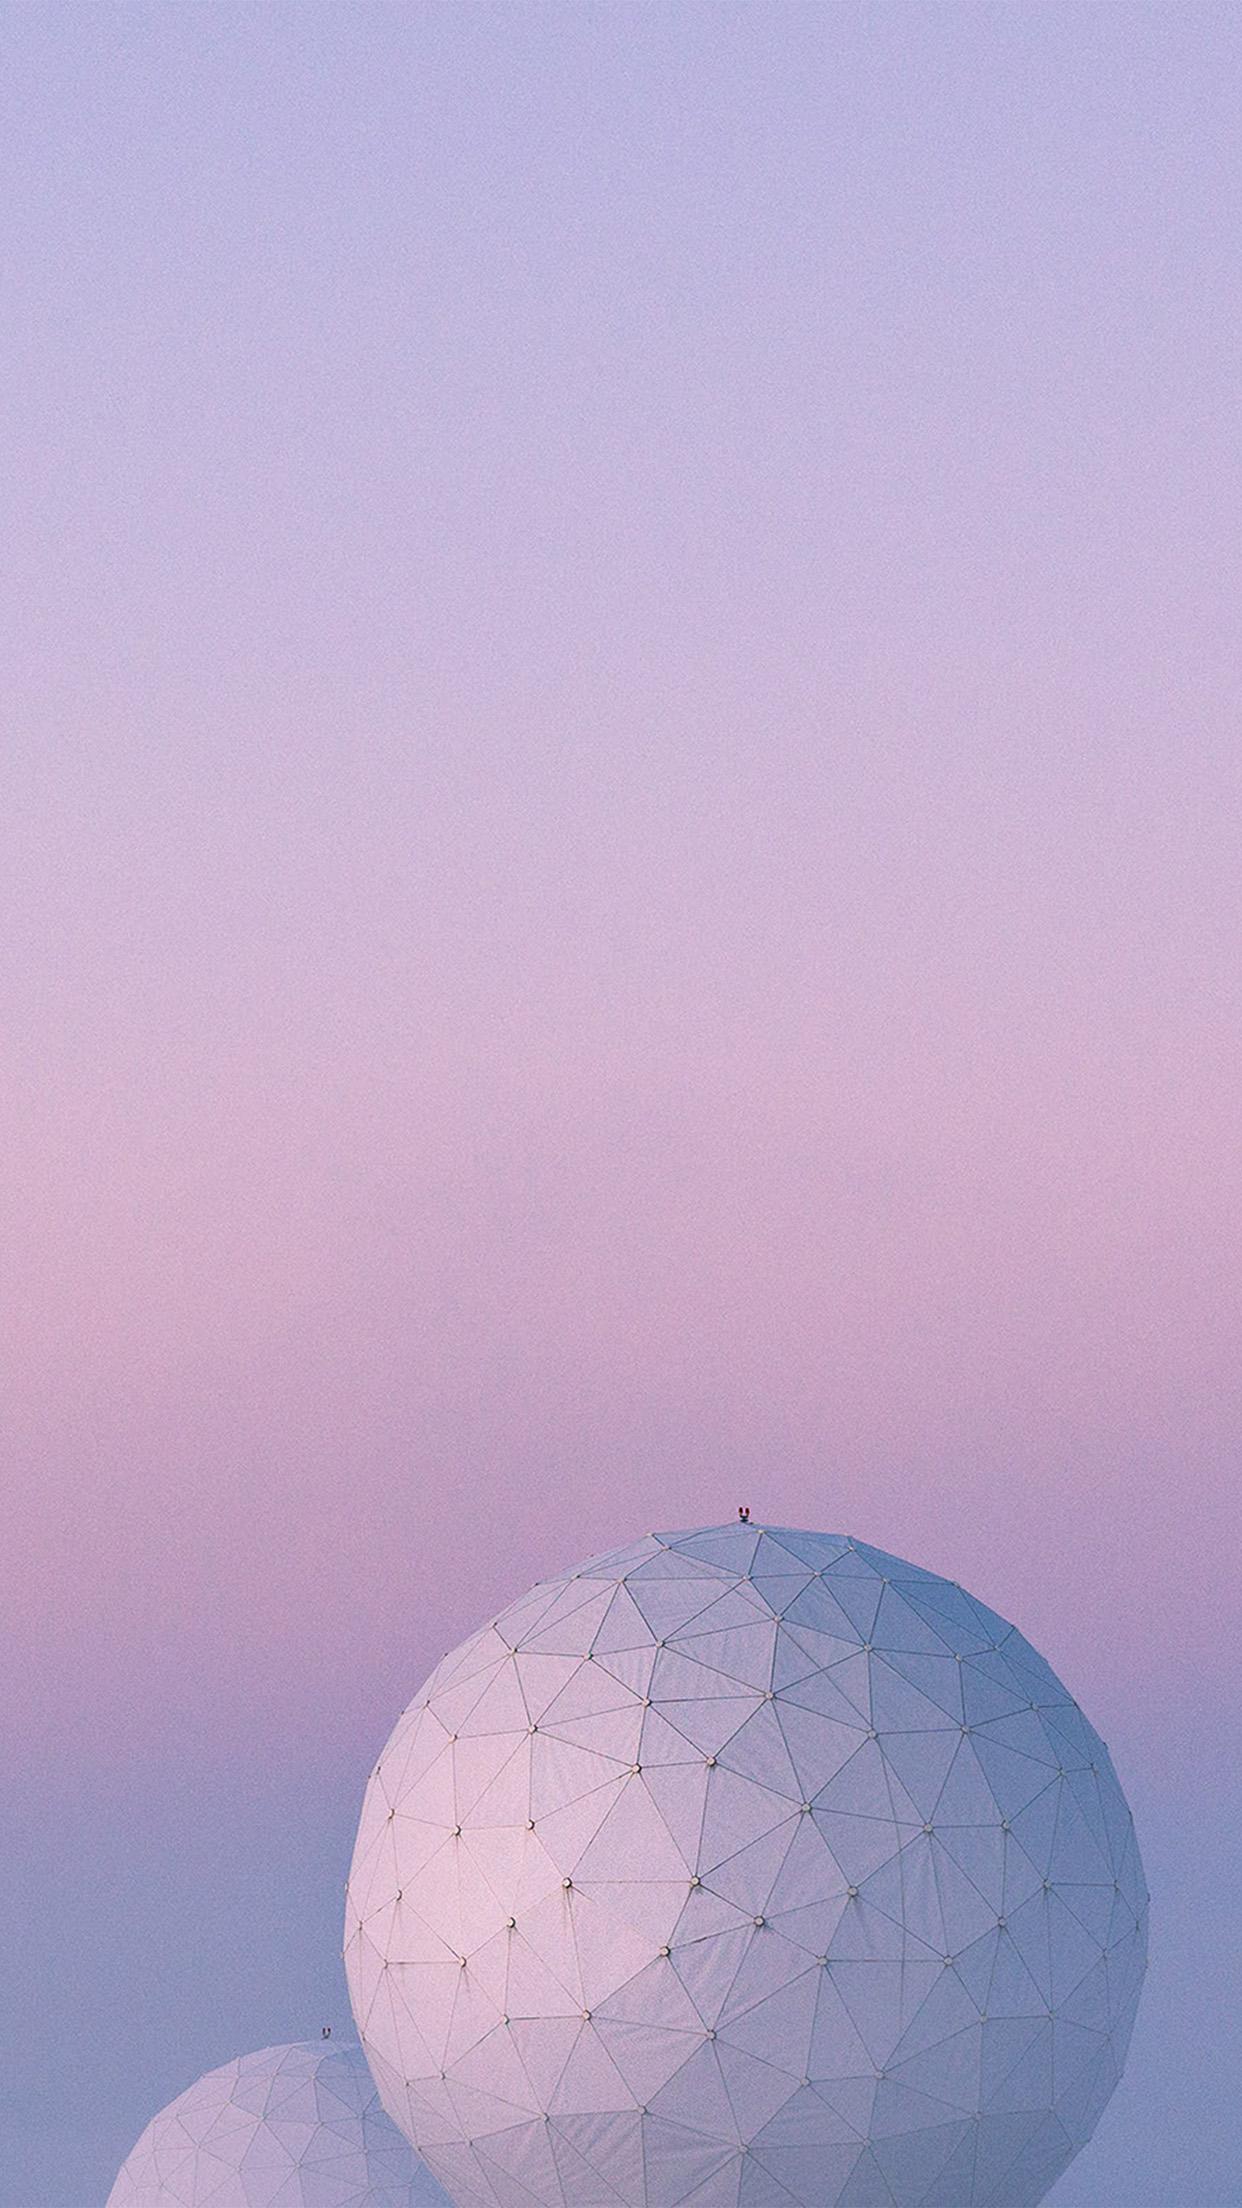 wb00-simple-sky-round-pink-gradation-pattern-background ...